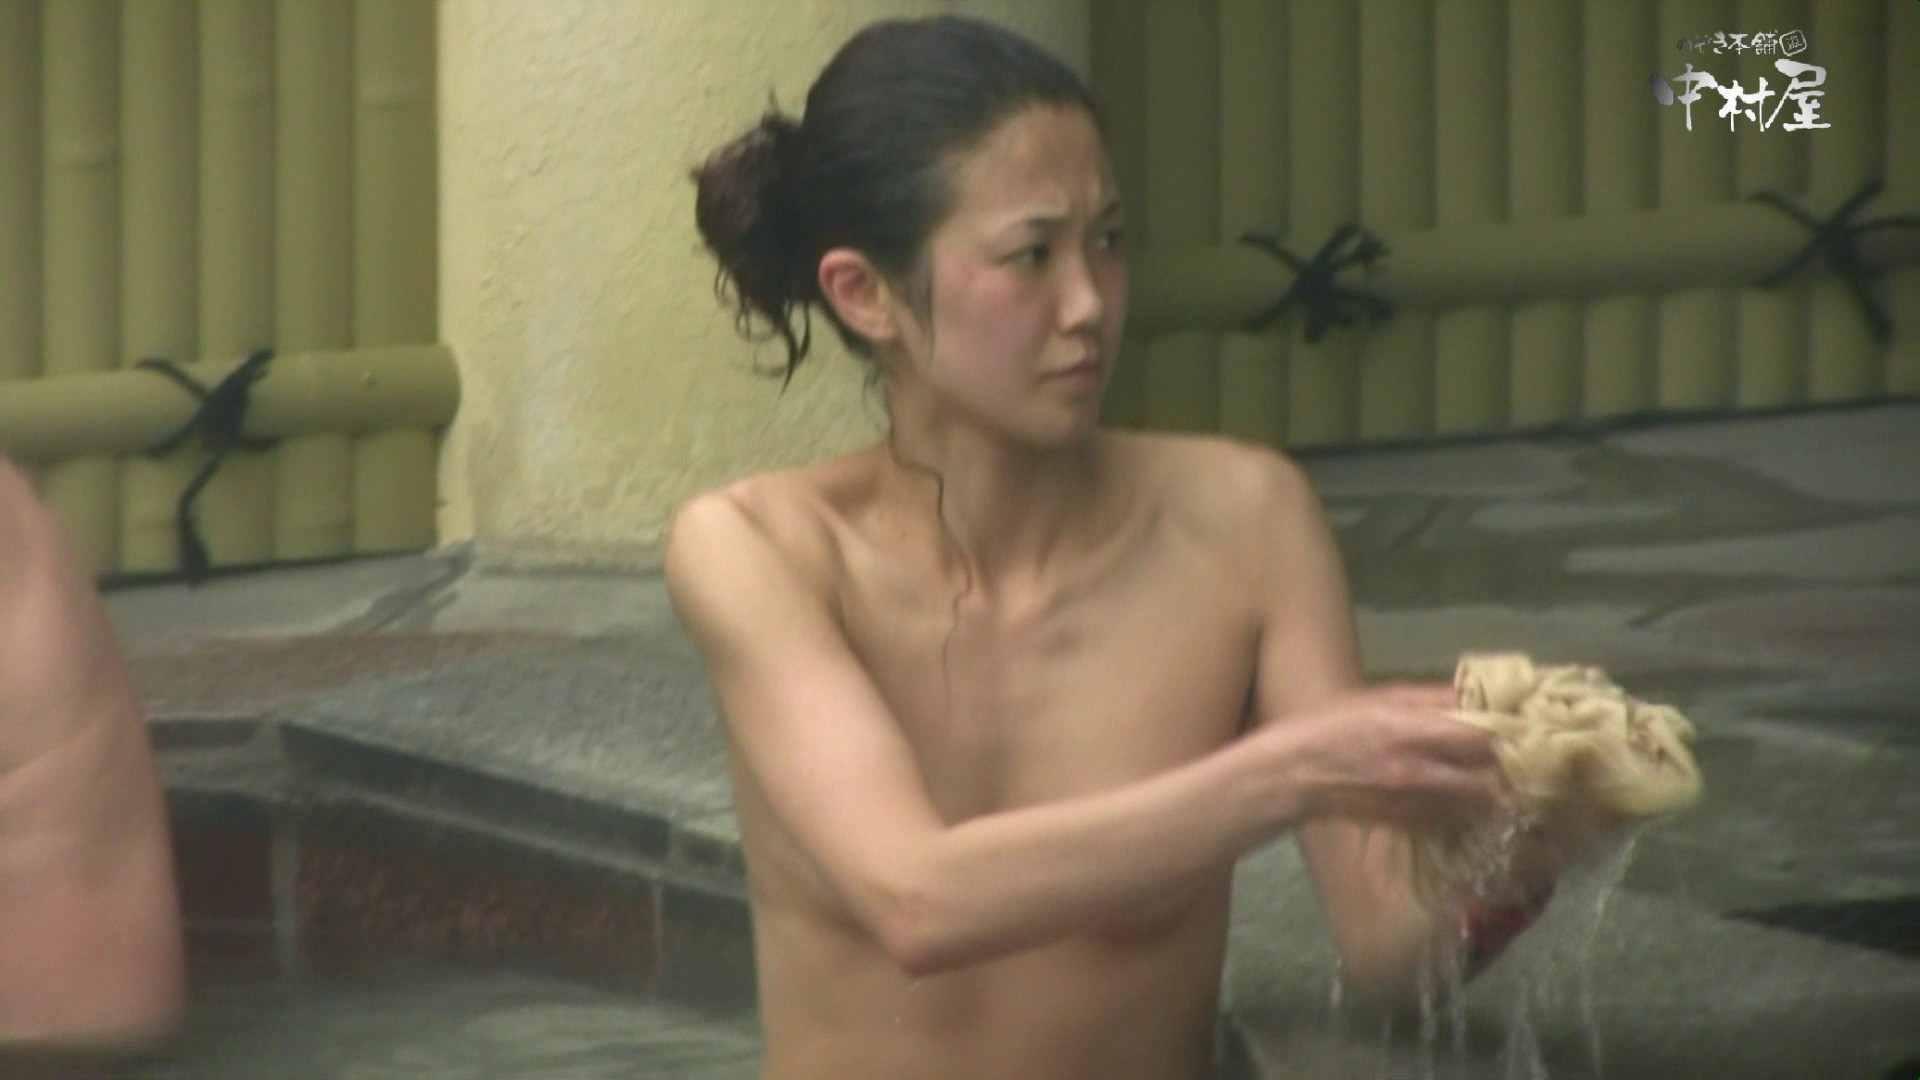 Aquaな露天風呂Vol.889 0  87連発 4